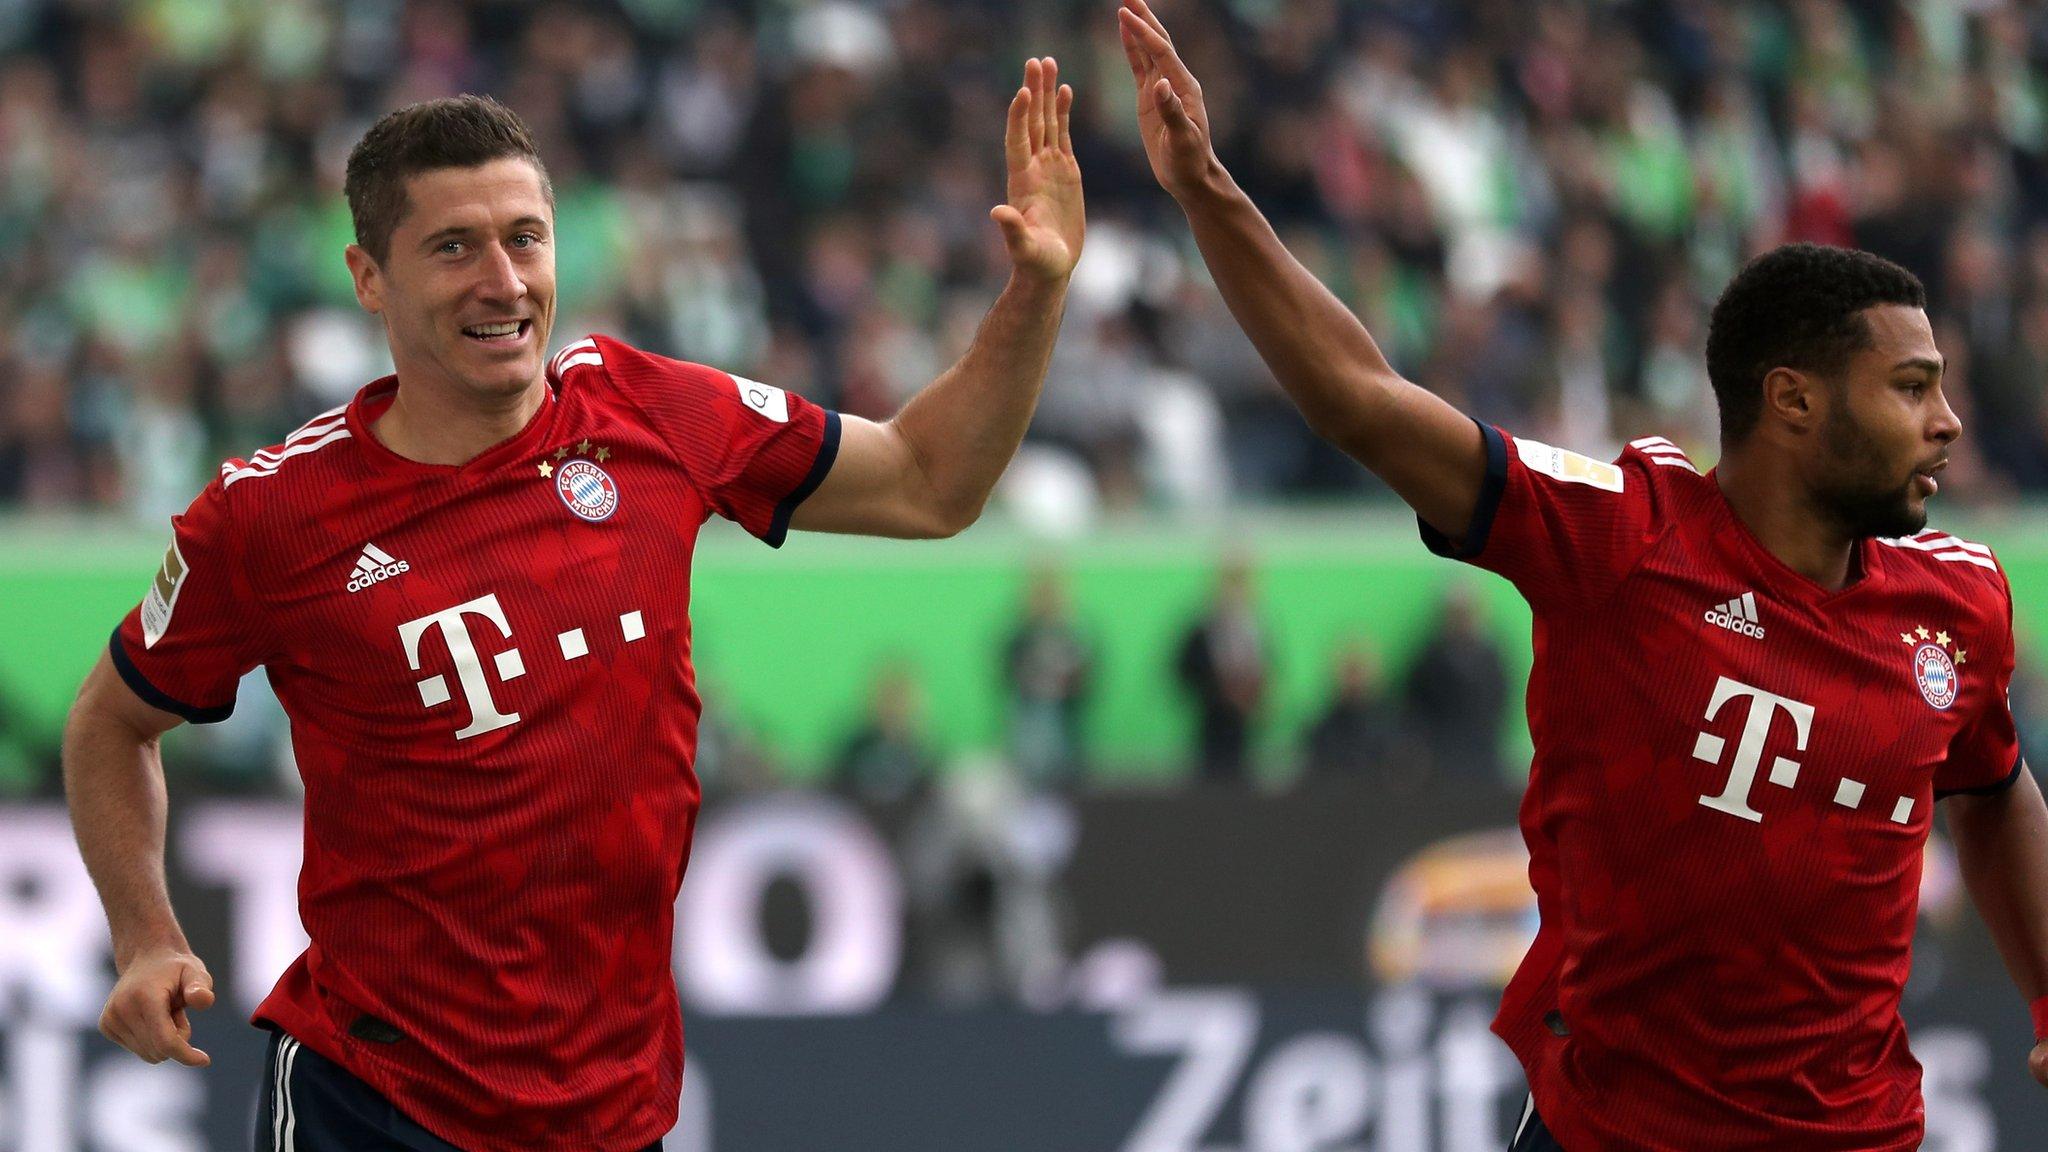 Wolfsburg 1-3 Bayern Munich: Robert Lewandowski helps champions end winless run